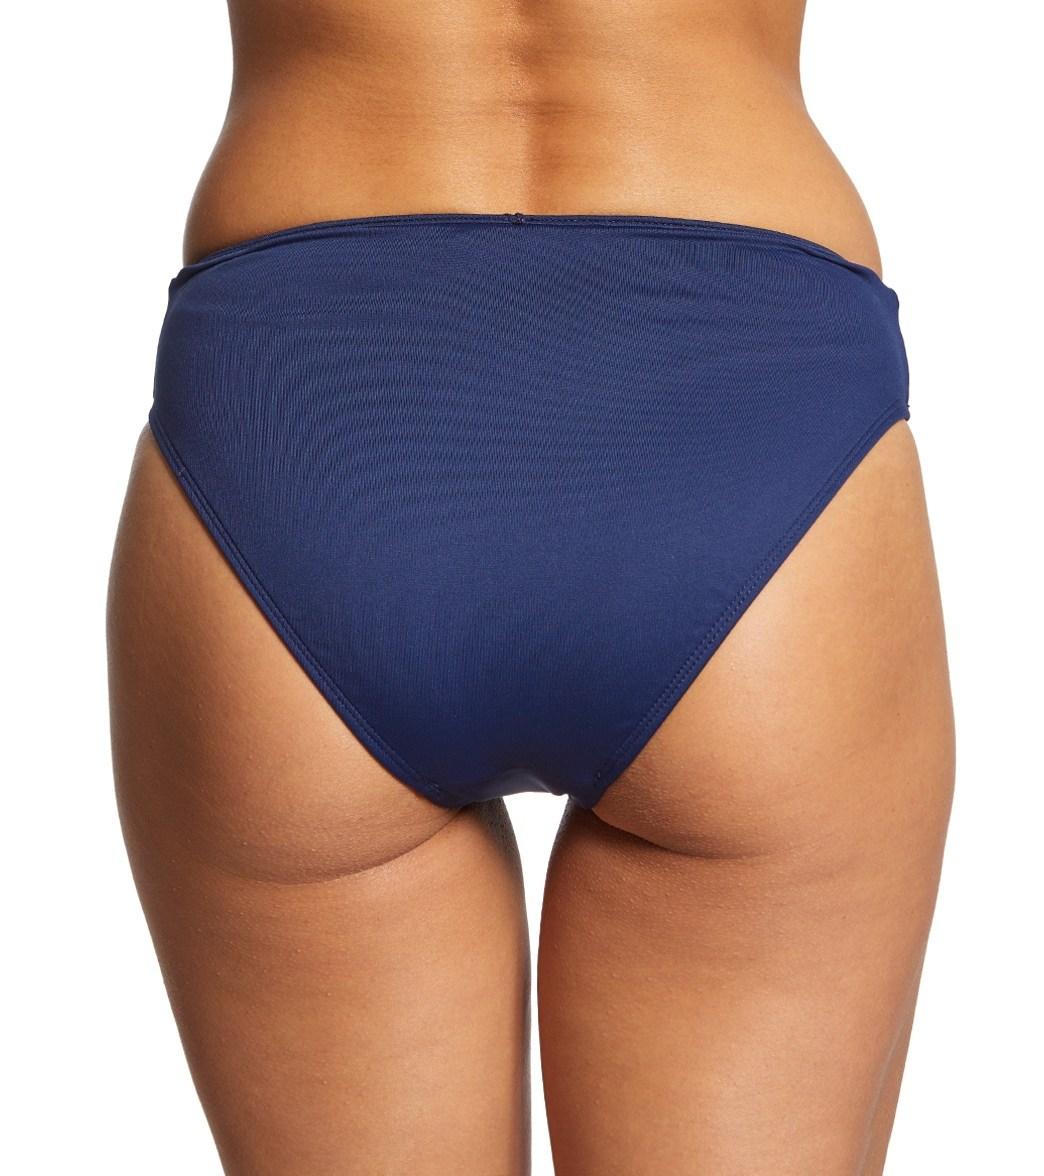 7b93572f6ac26 Polo Ralph Lauren Icon Classic Hi-Waist Bikini Bottom at SwimOutlet ...